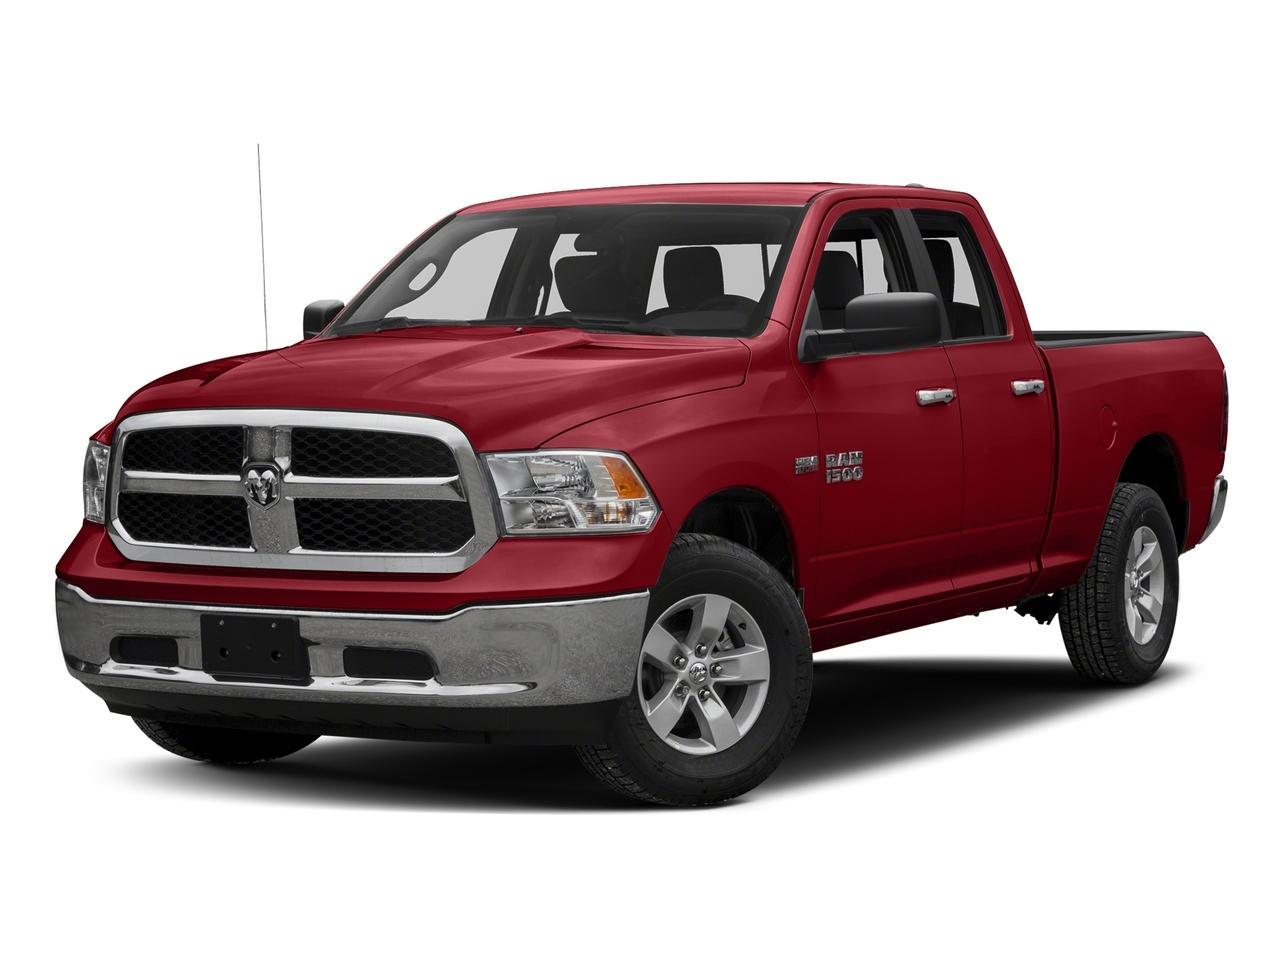 2017 Ram 1500 Vehicle Photo in North Richland Hills, TX 76180